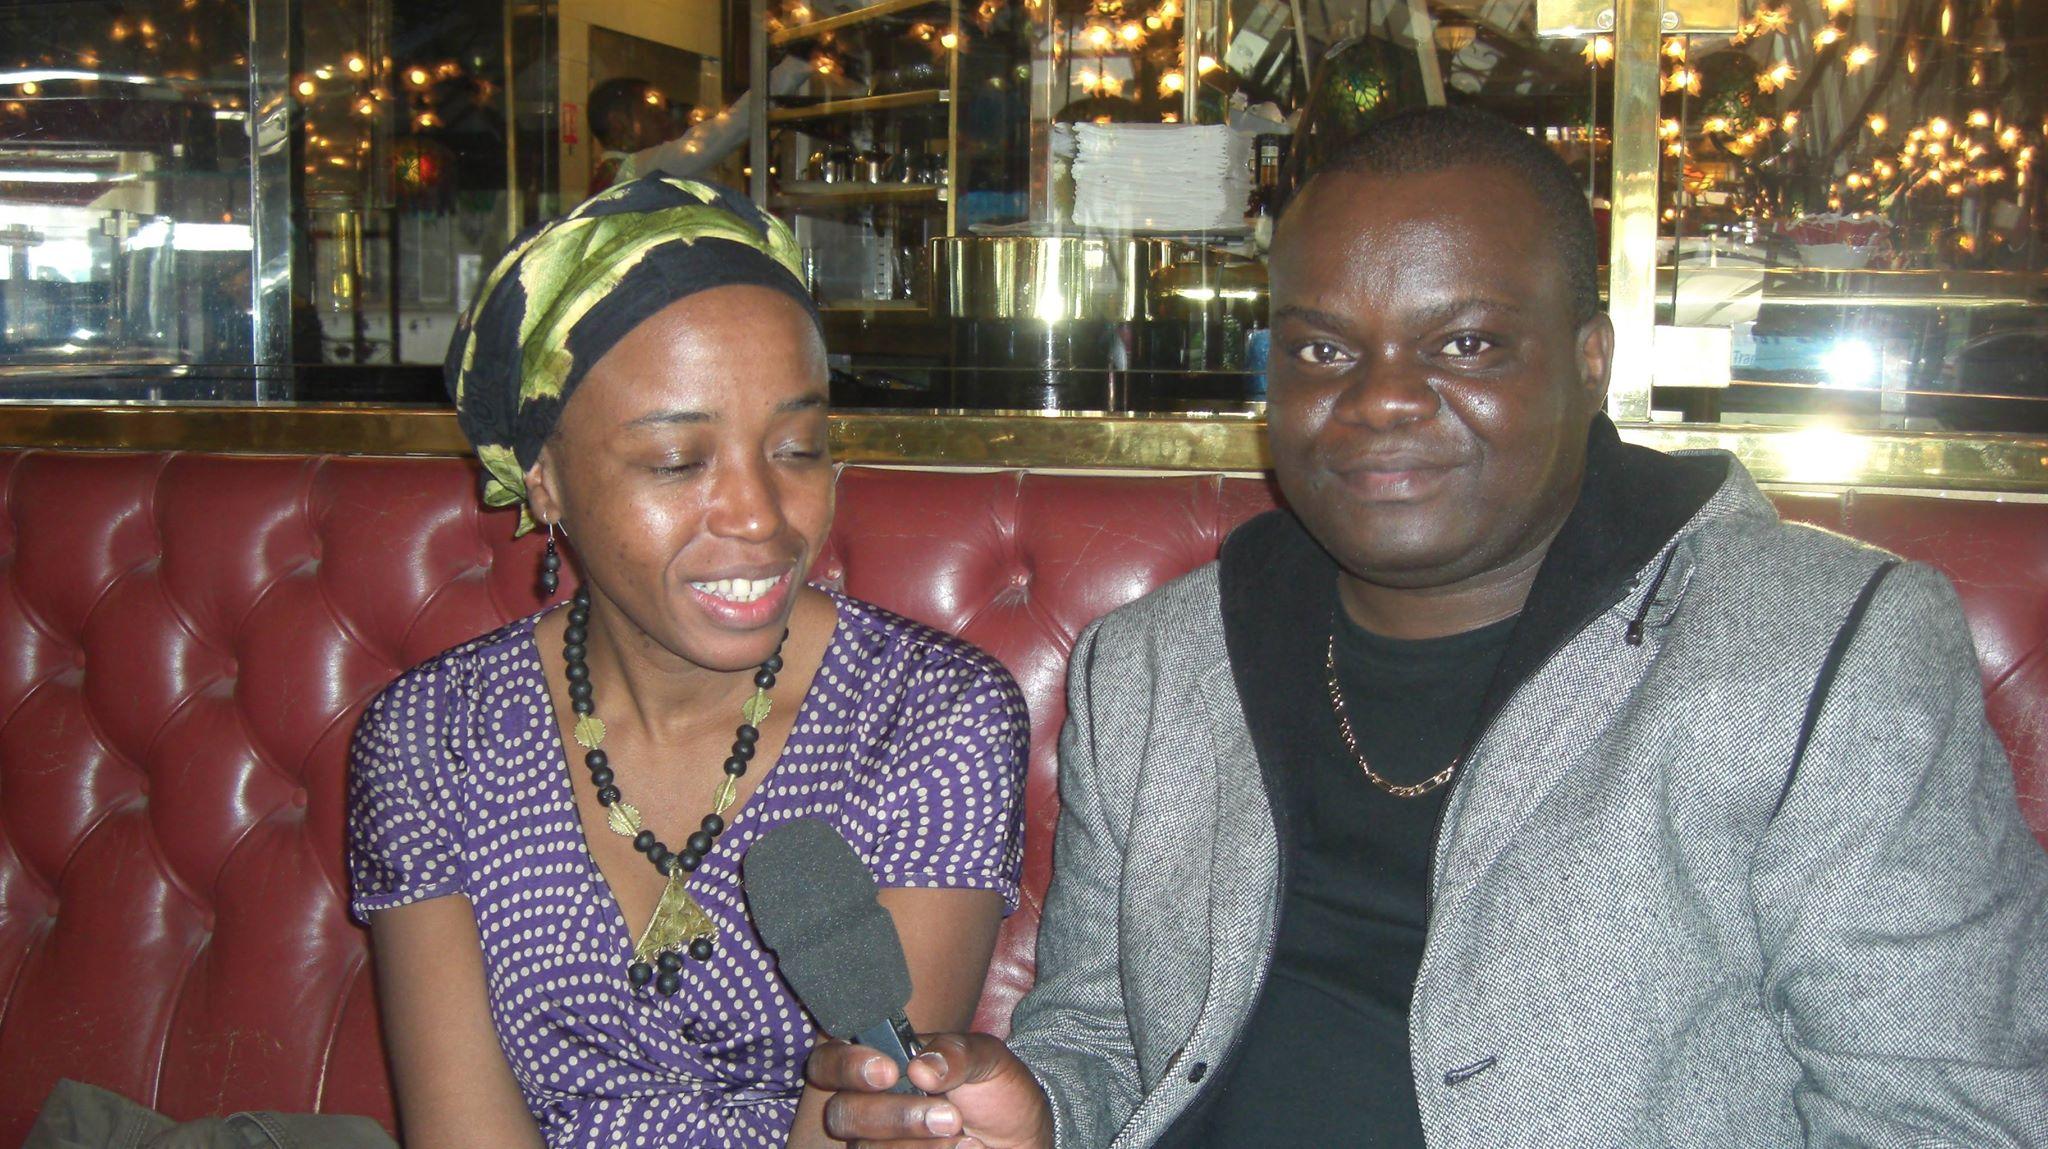 Dictature inavouée, nouvel album de Tita Nzebi